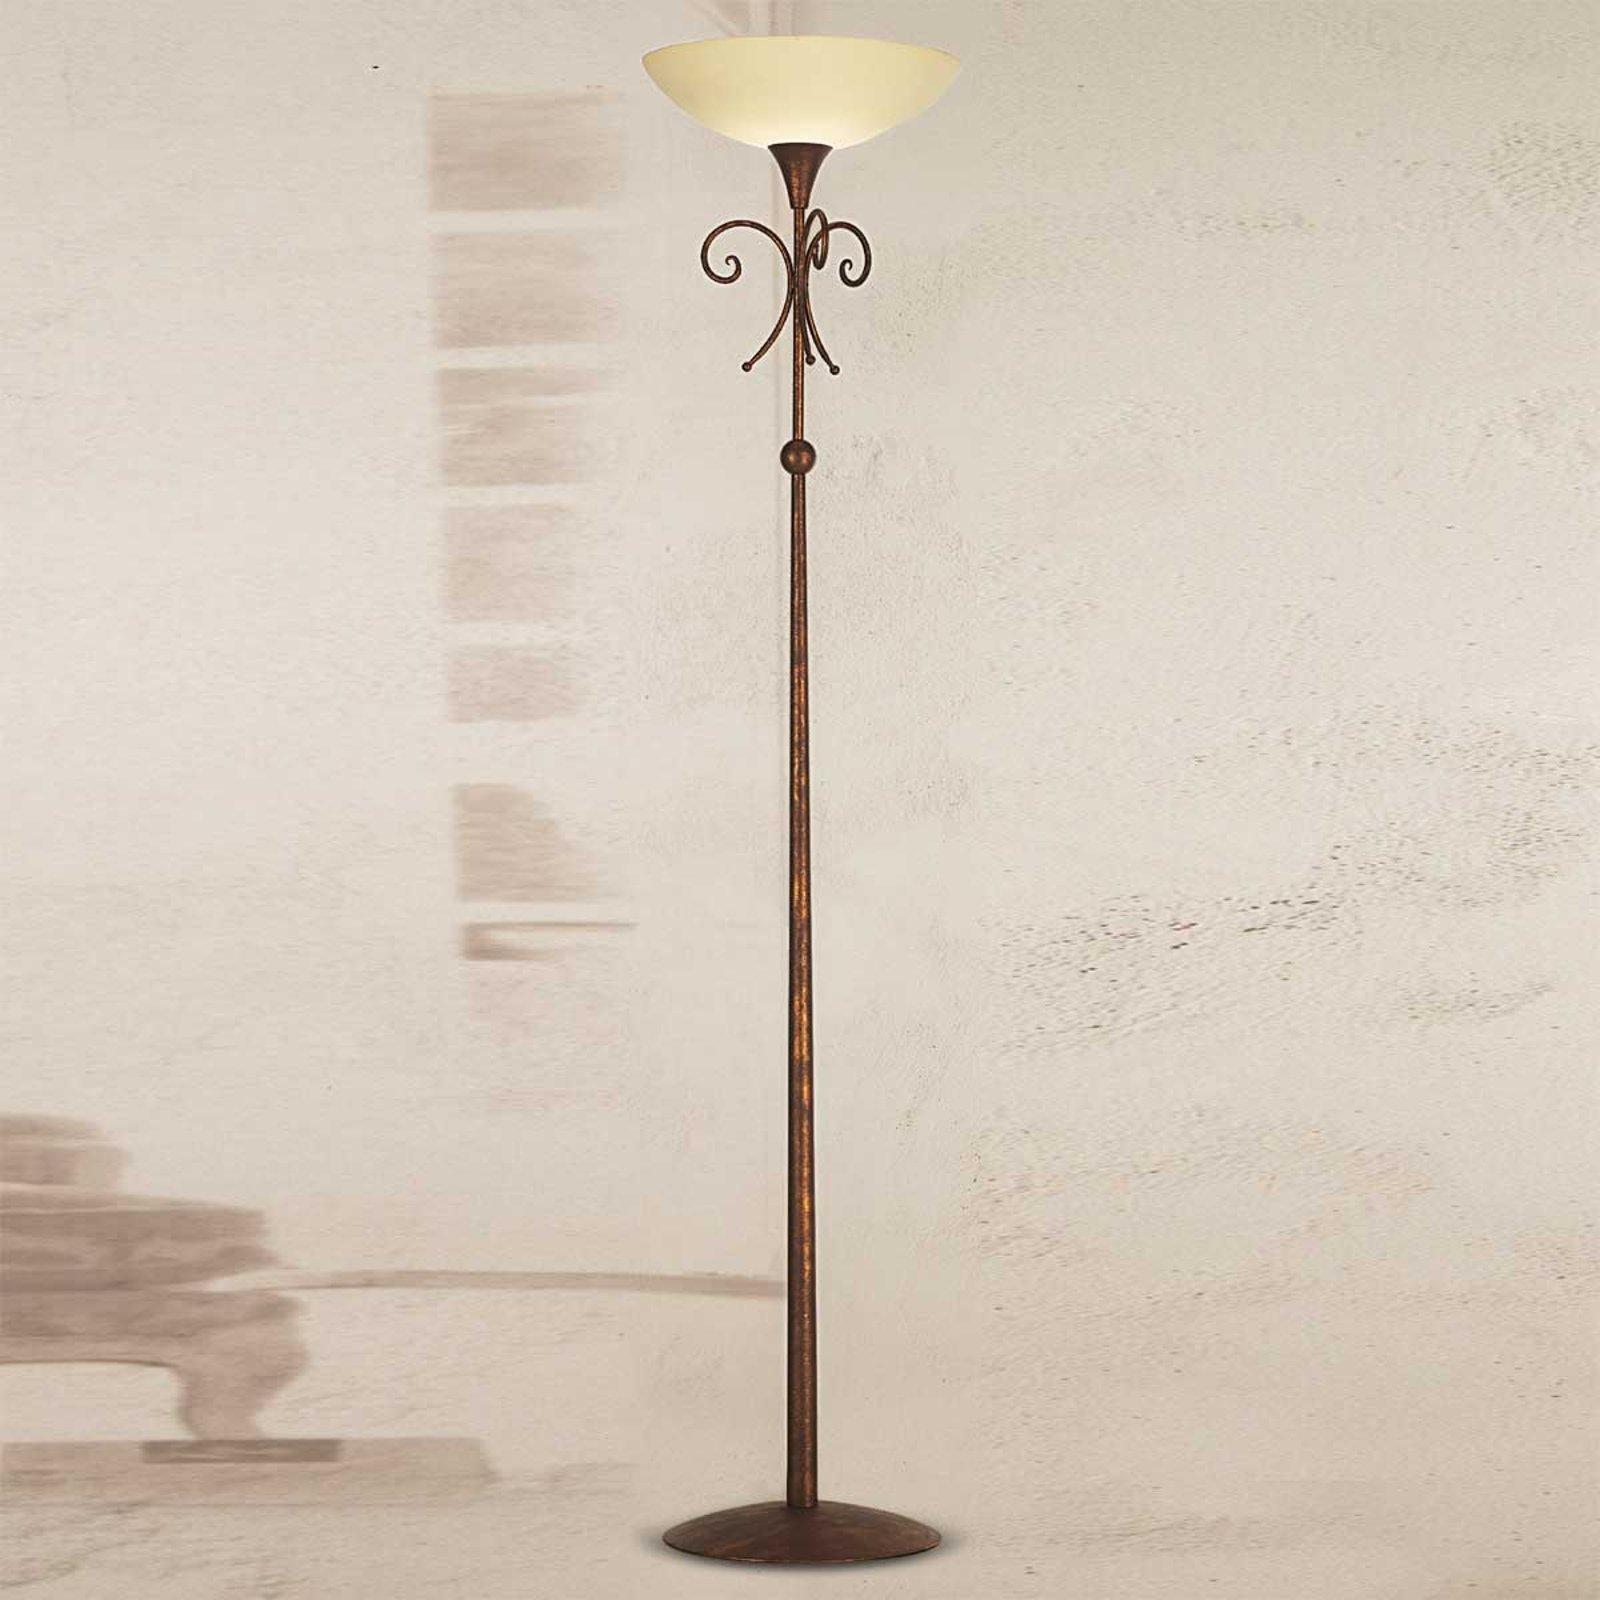 Antikkbrun stålampe Federico